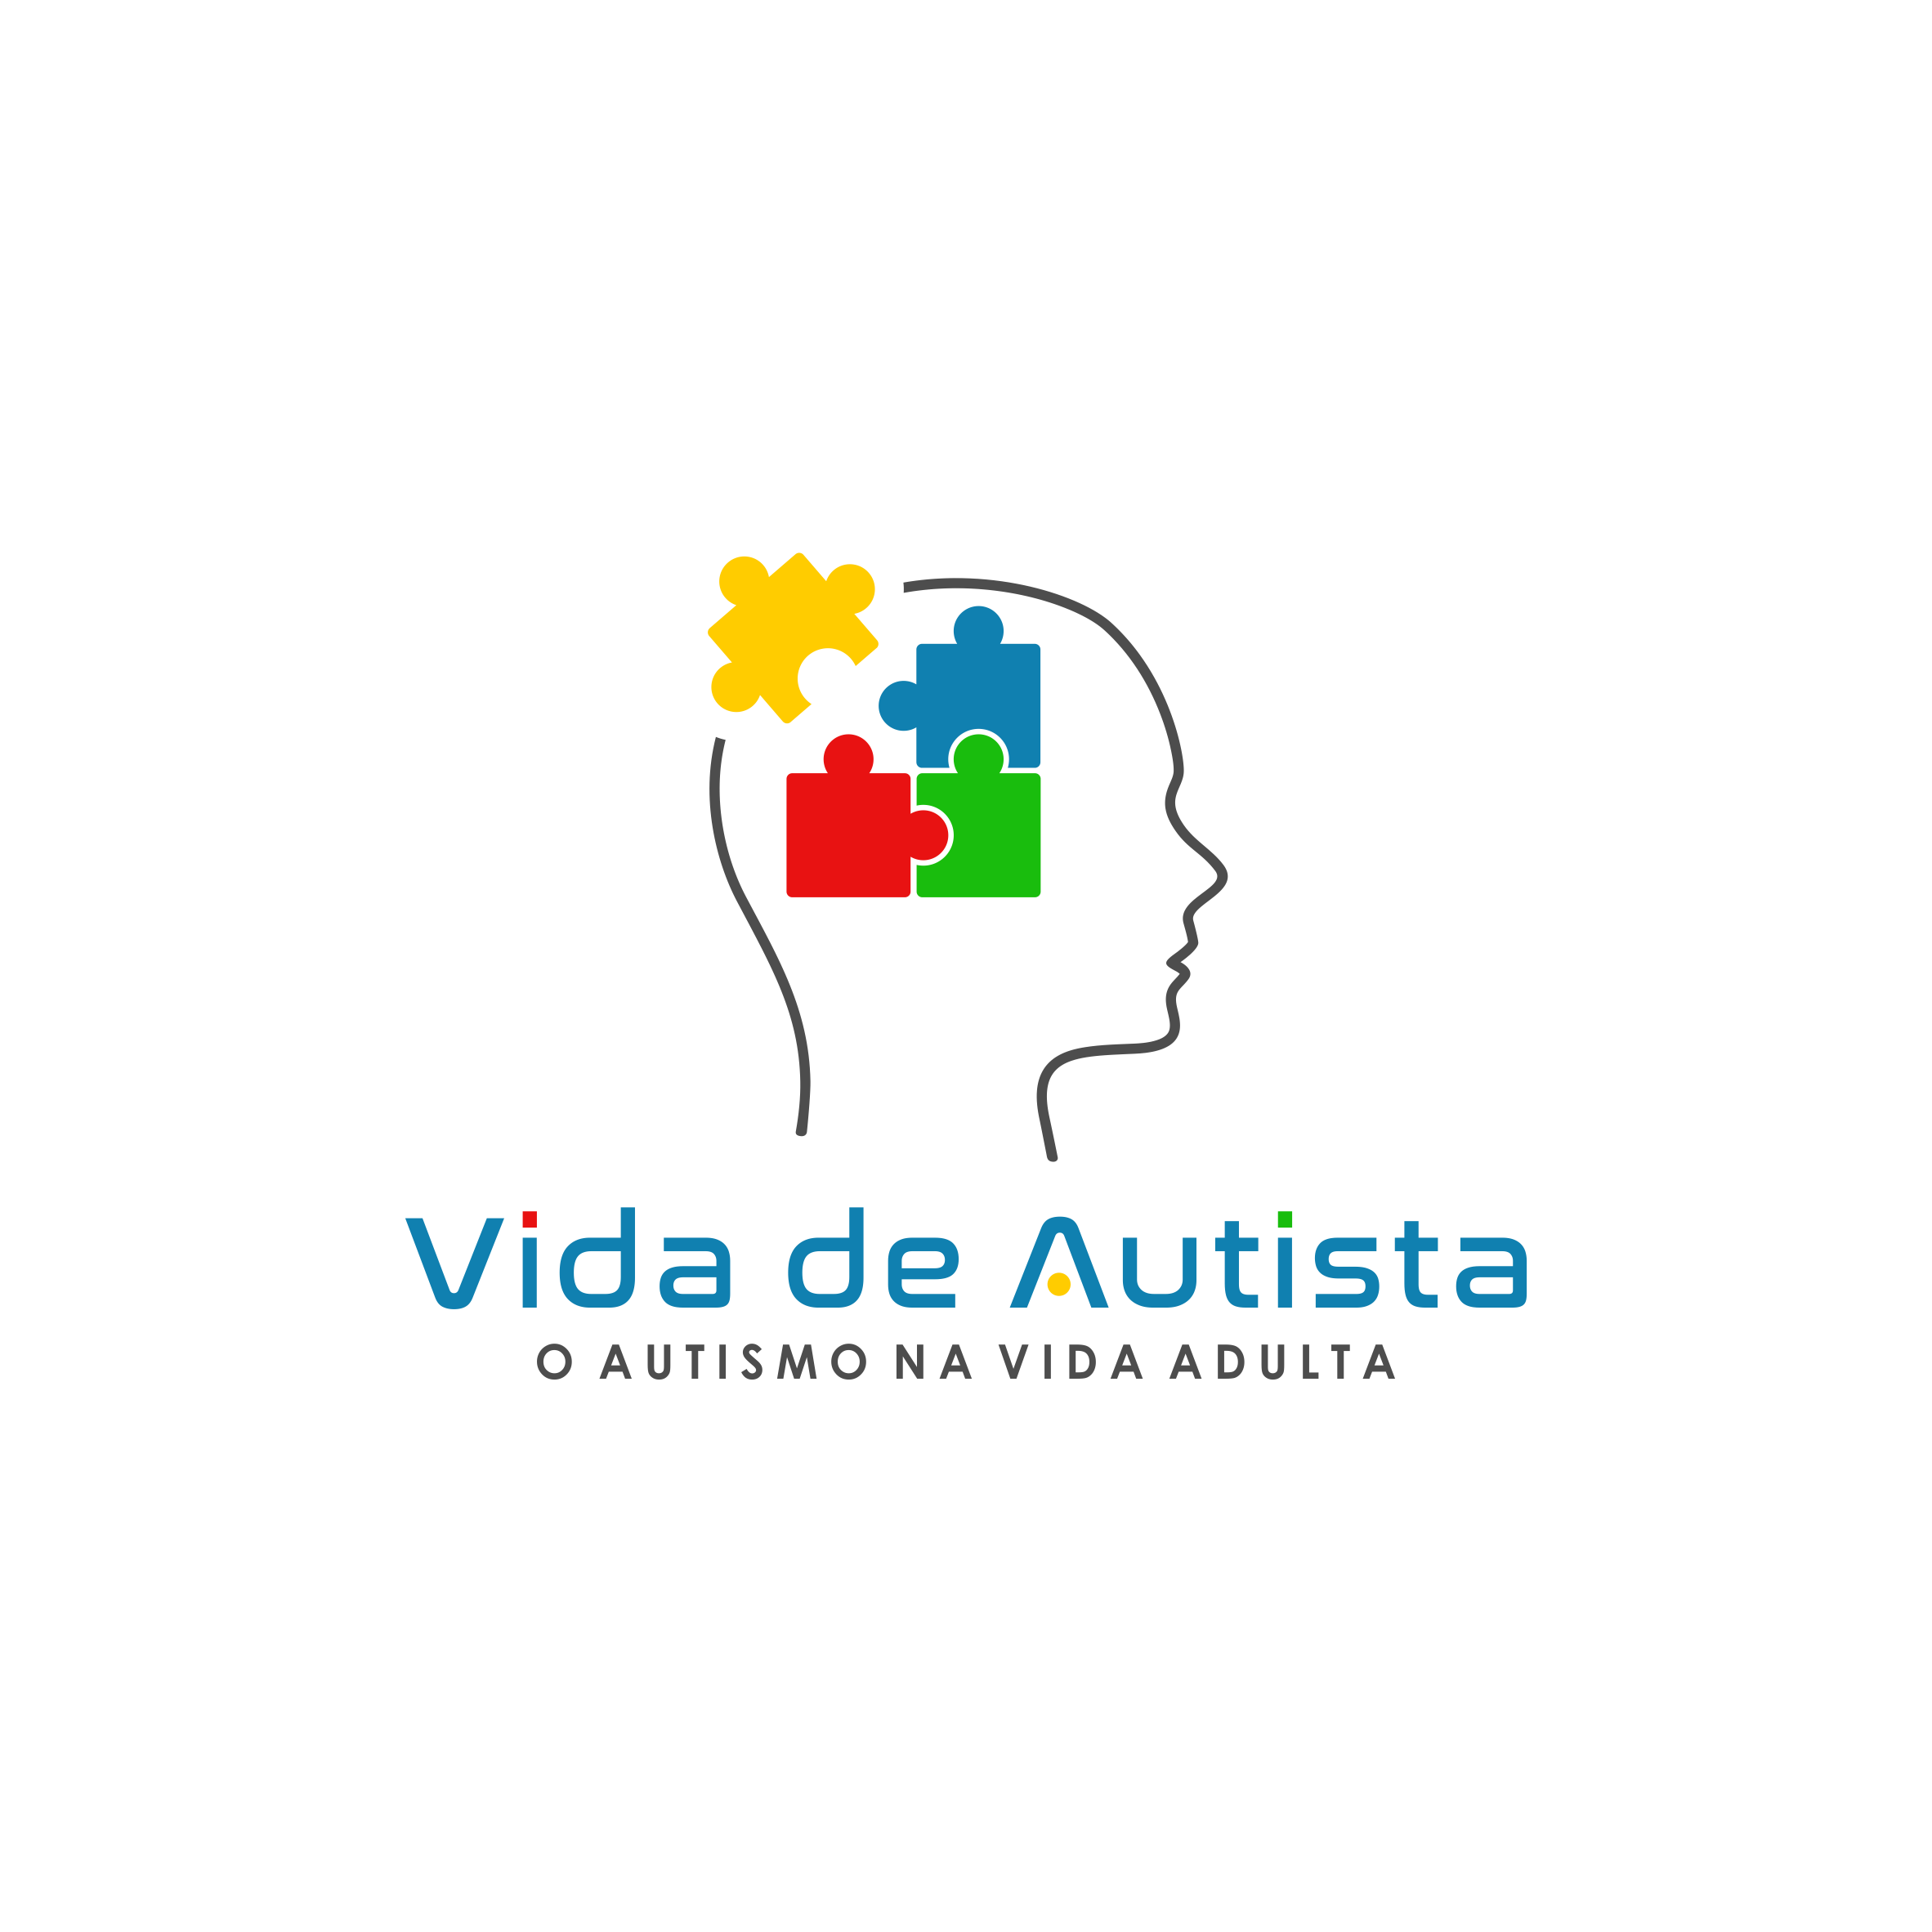 Logo   vida de autista